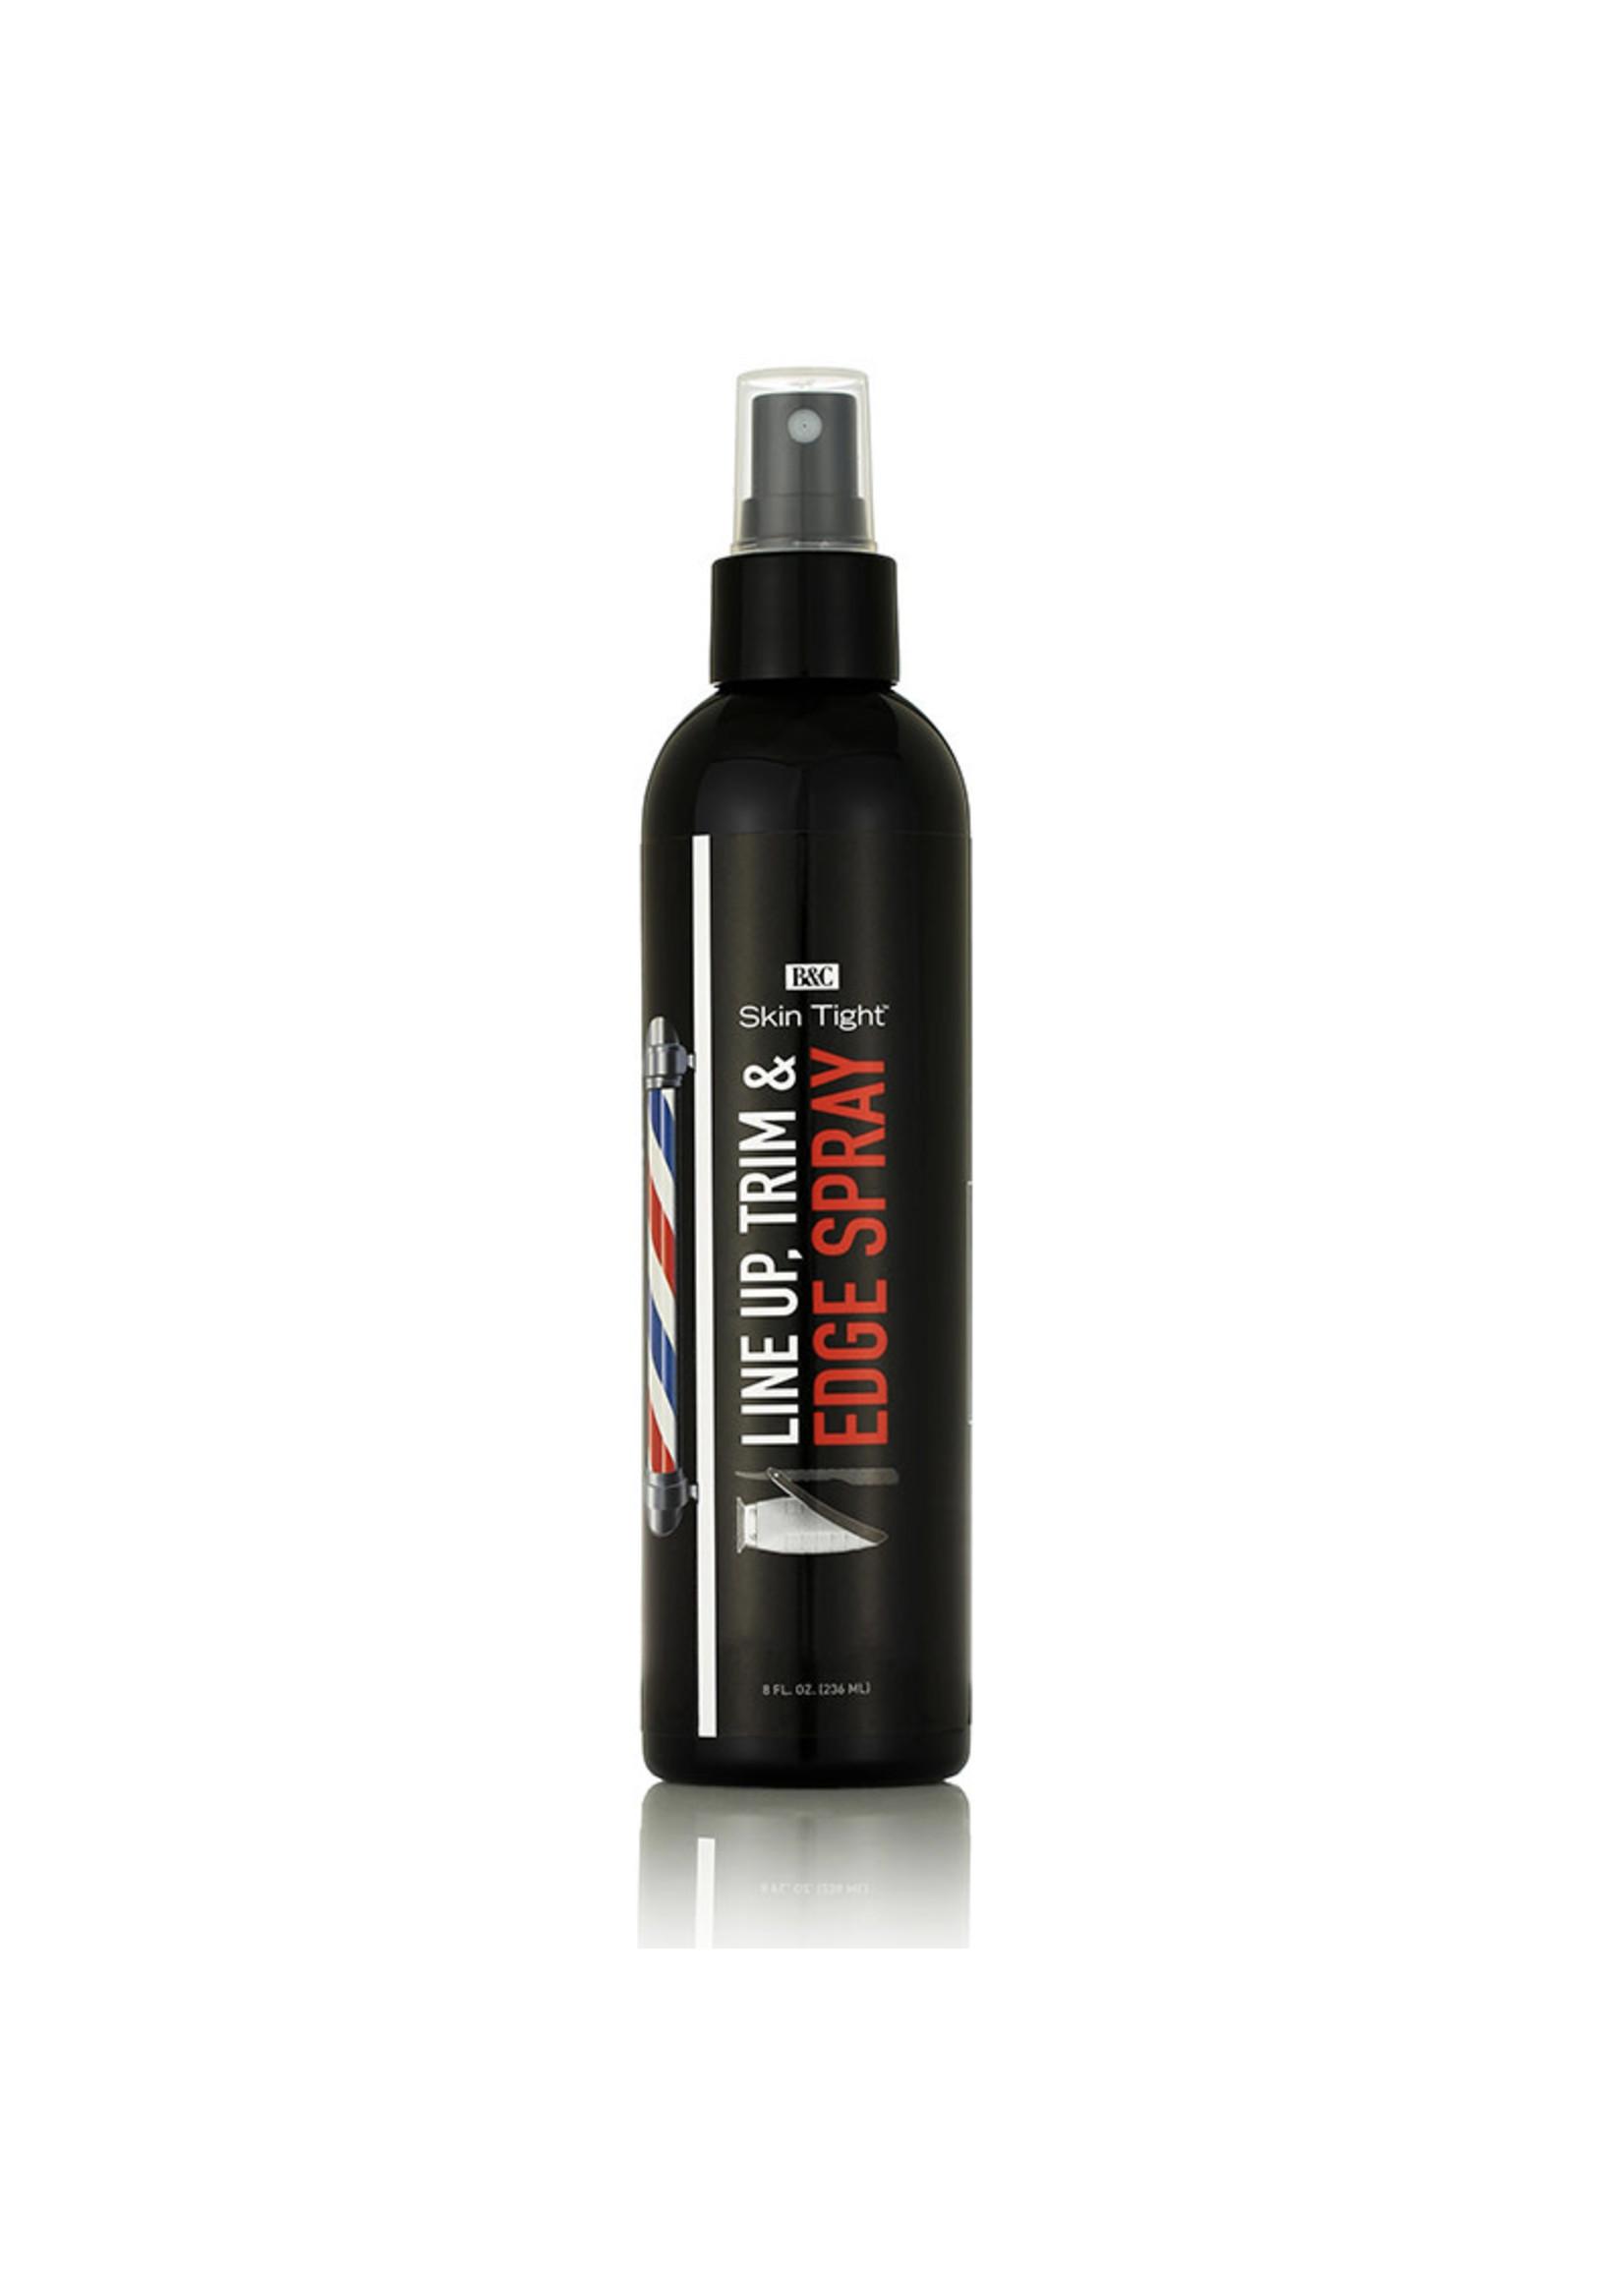 B&C Skin Tight Trim Edge Spray